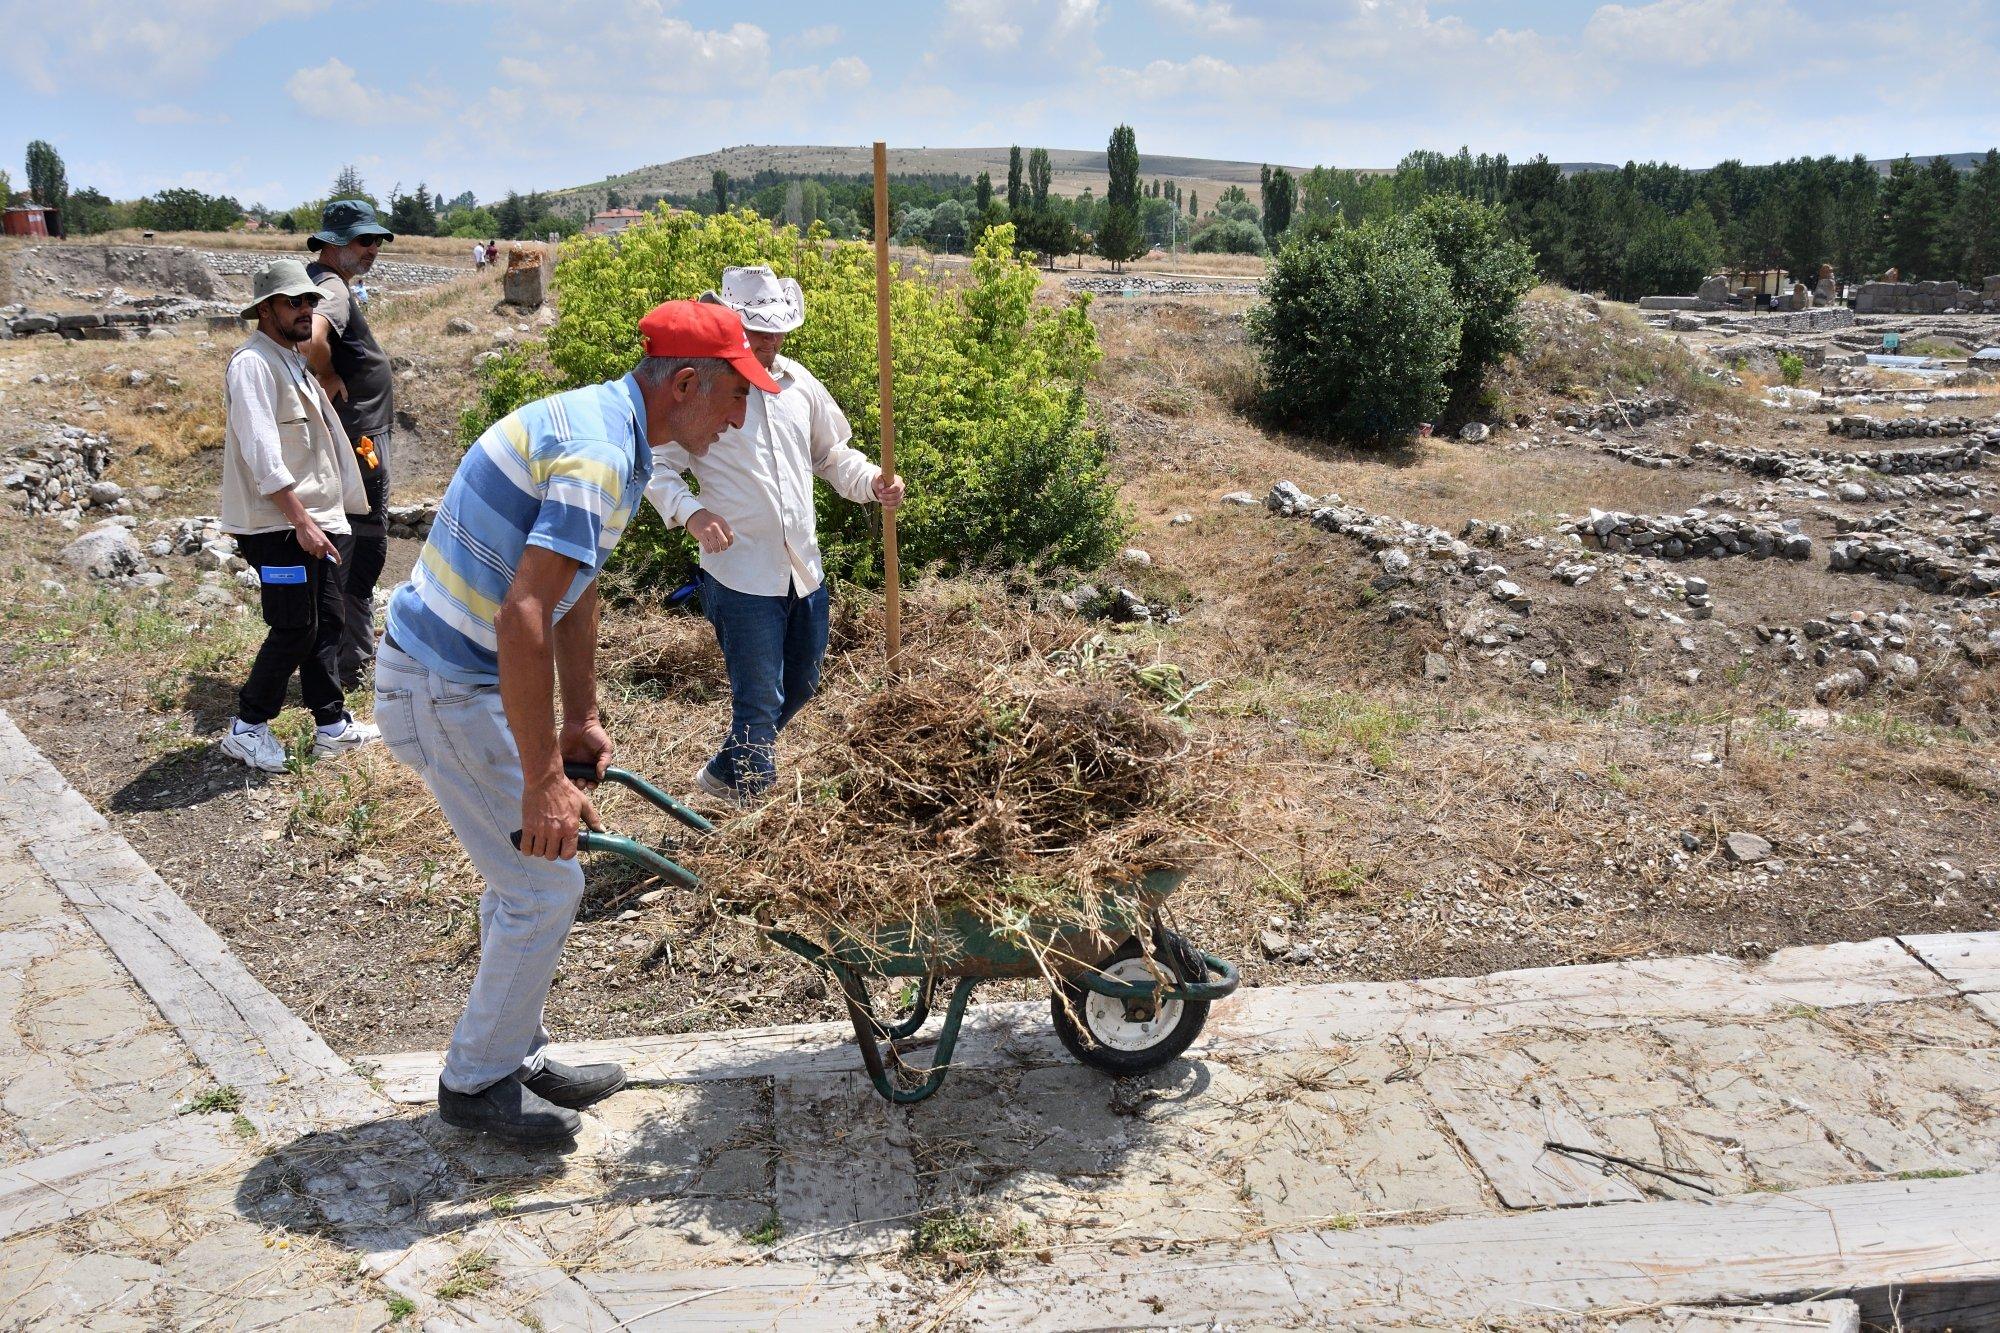 An official helps clear weeds in Alacahöyük, Çorum, central Turkey, on August 3, 2021. (AA Photo)